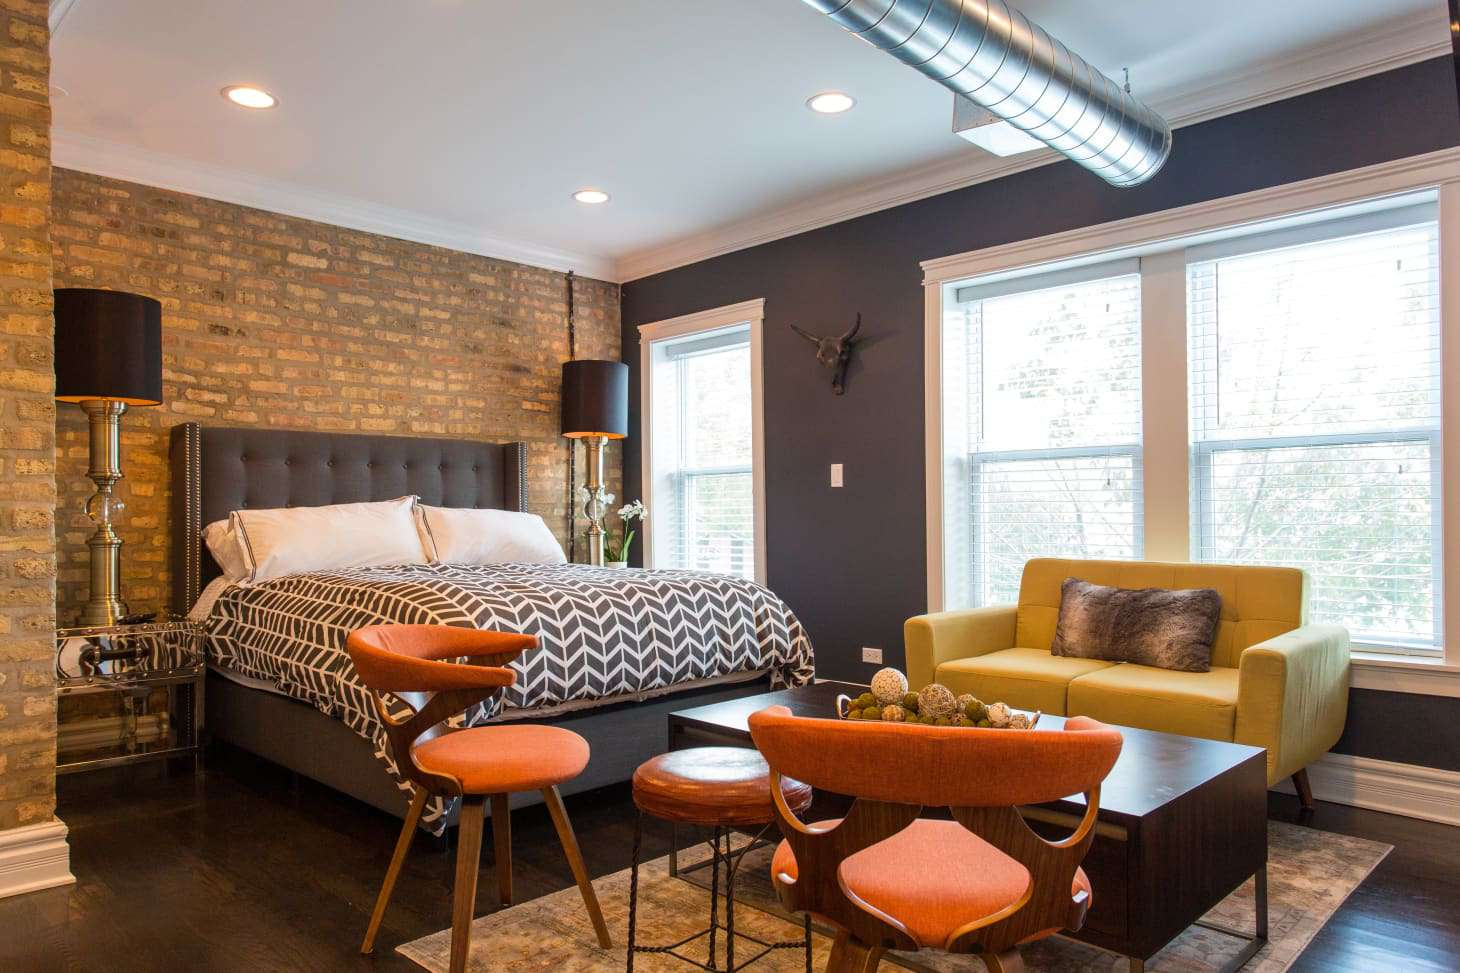 Best Airbnb Decorating Ideas